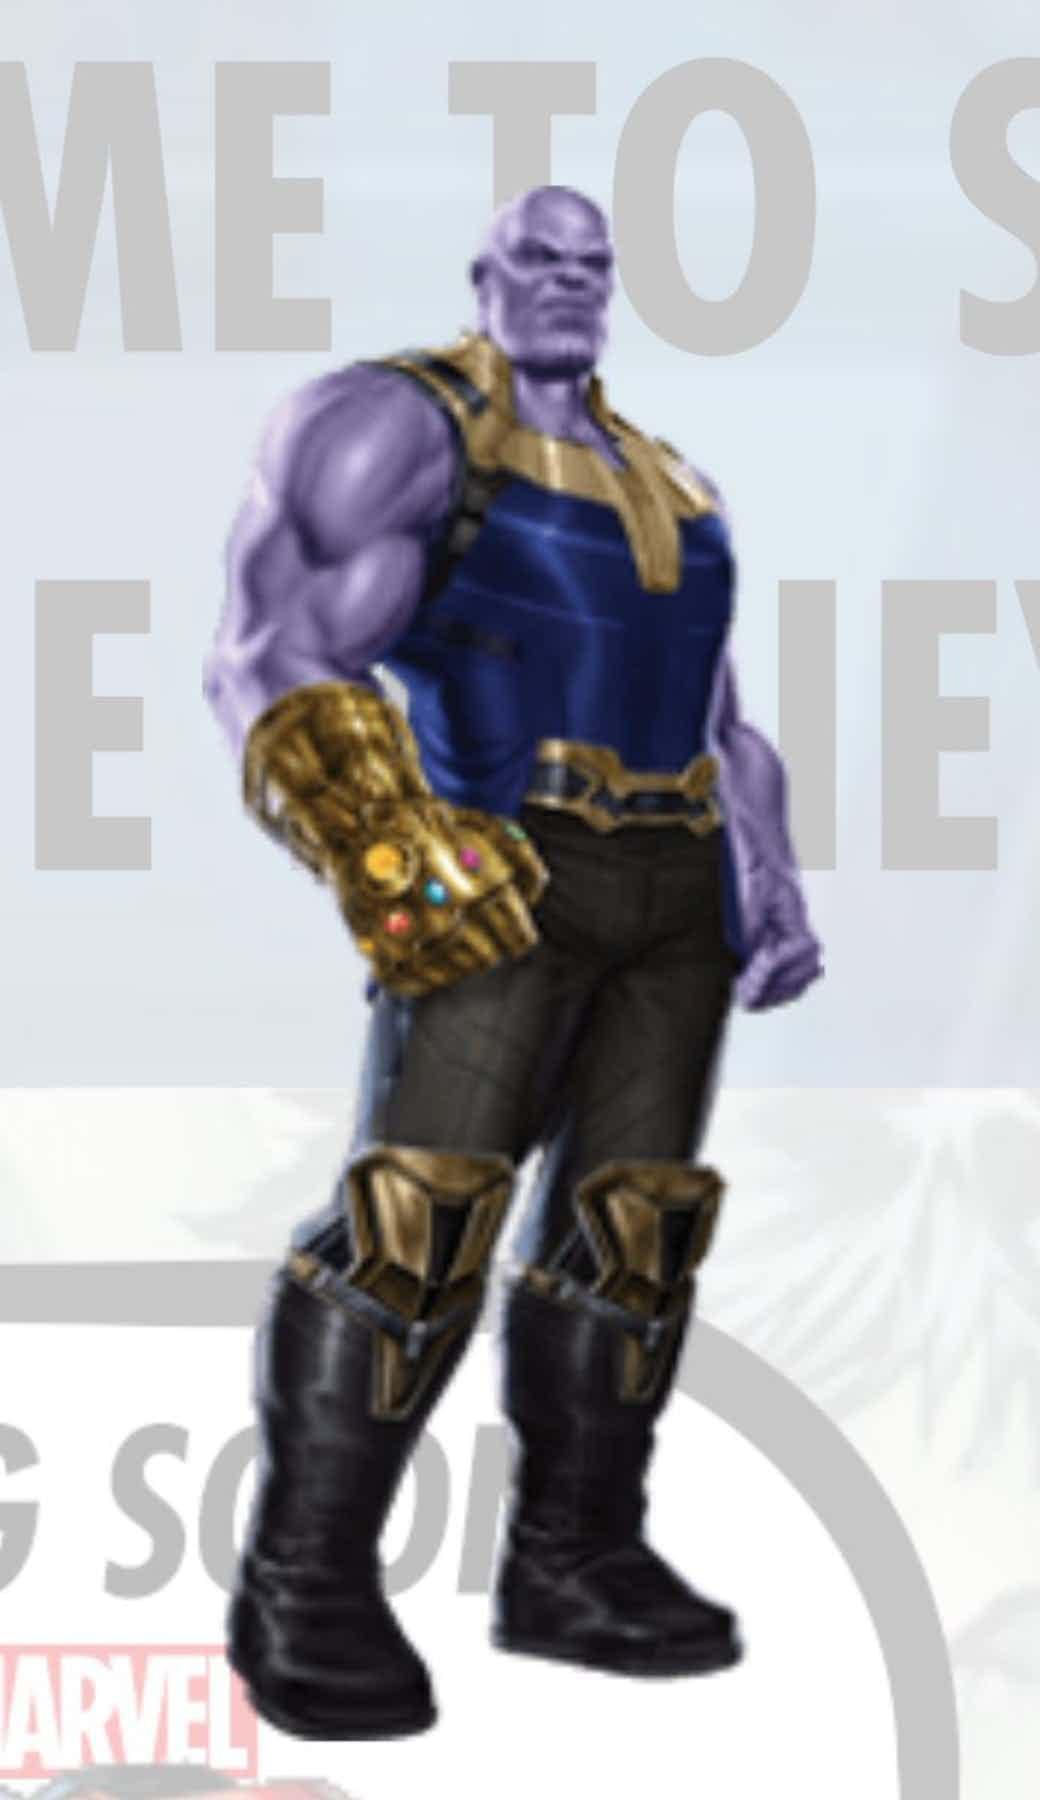 Thanos-Avengers-Infinity-War-promo-art-Savii 4fa70f104b67